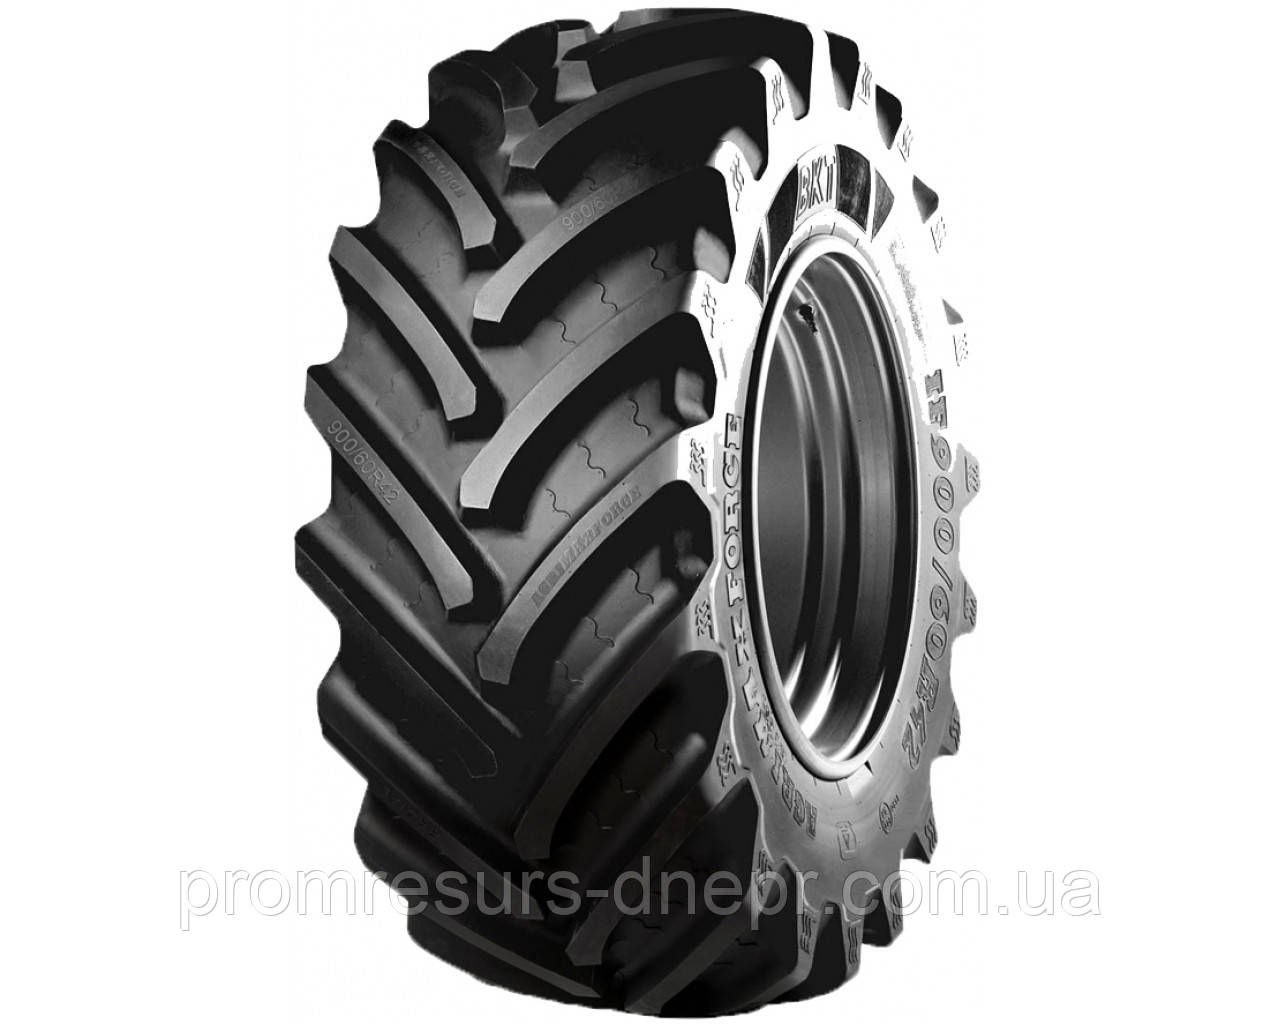 Шина пневматическая тракторная 650/65 R38 166A8/163D BKT RT657 TL